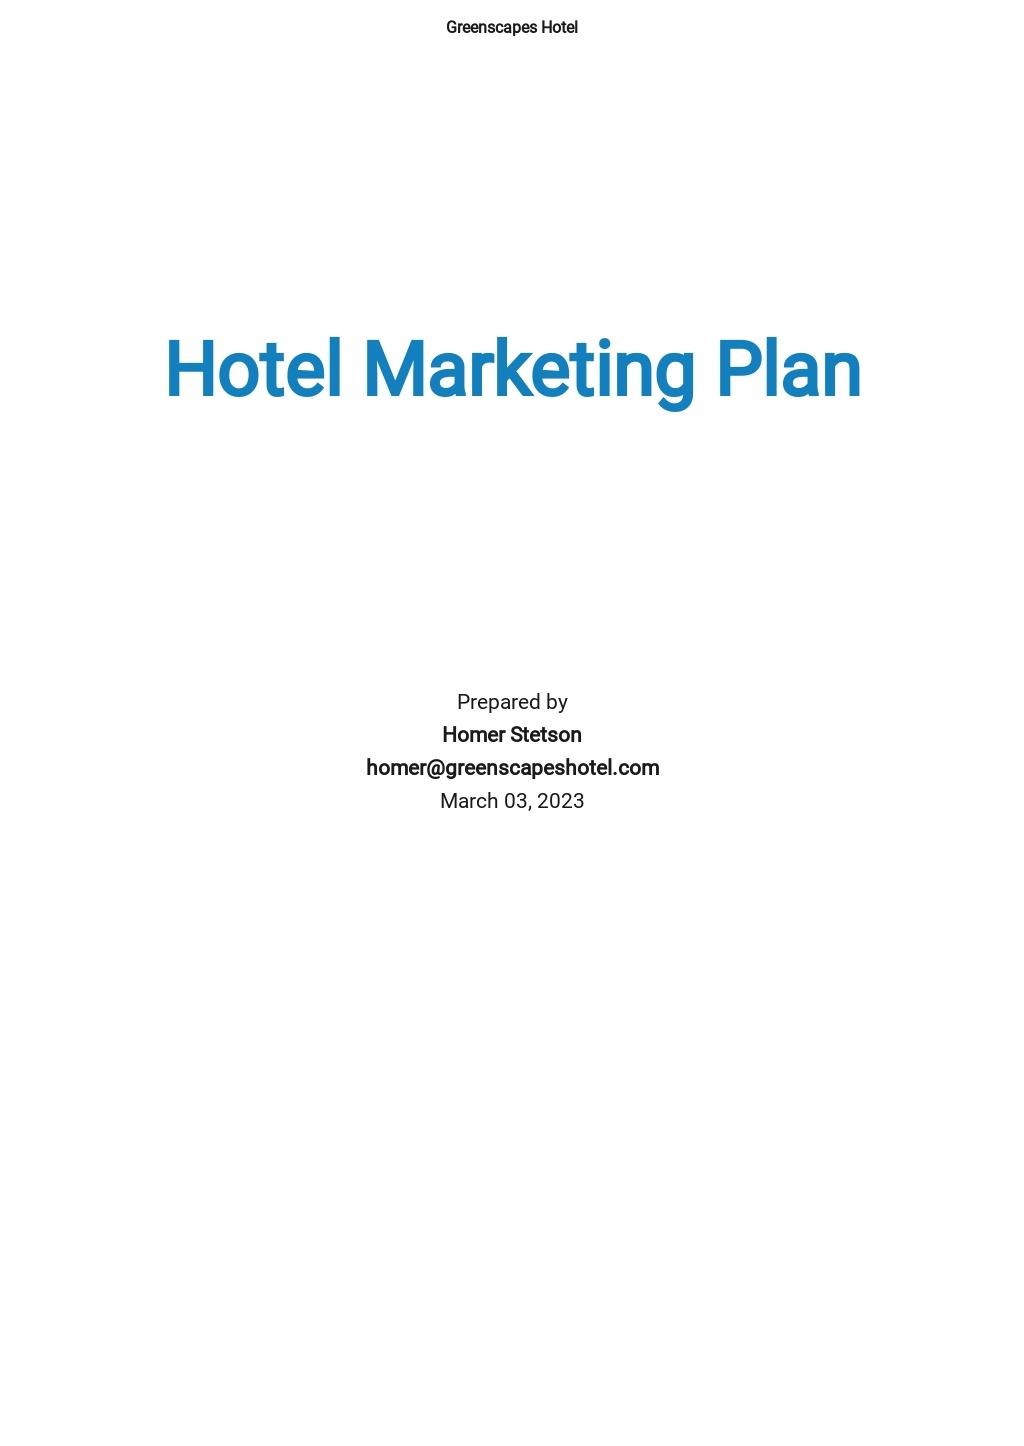 Hotel Marketing Plan Template.jpe